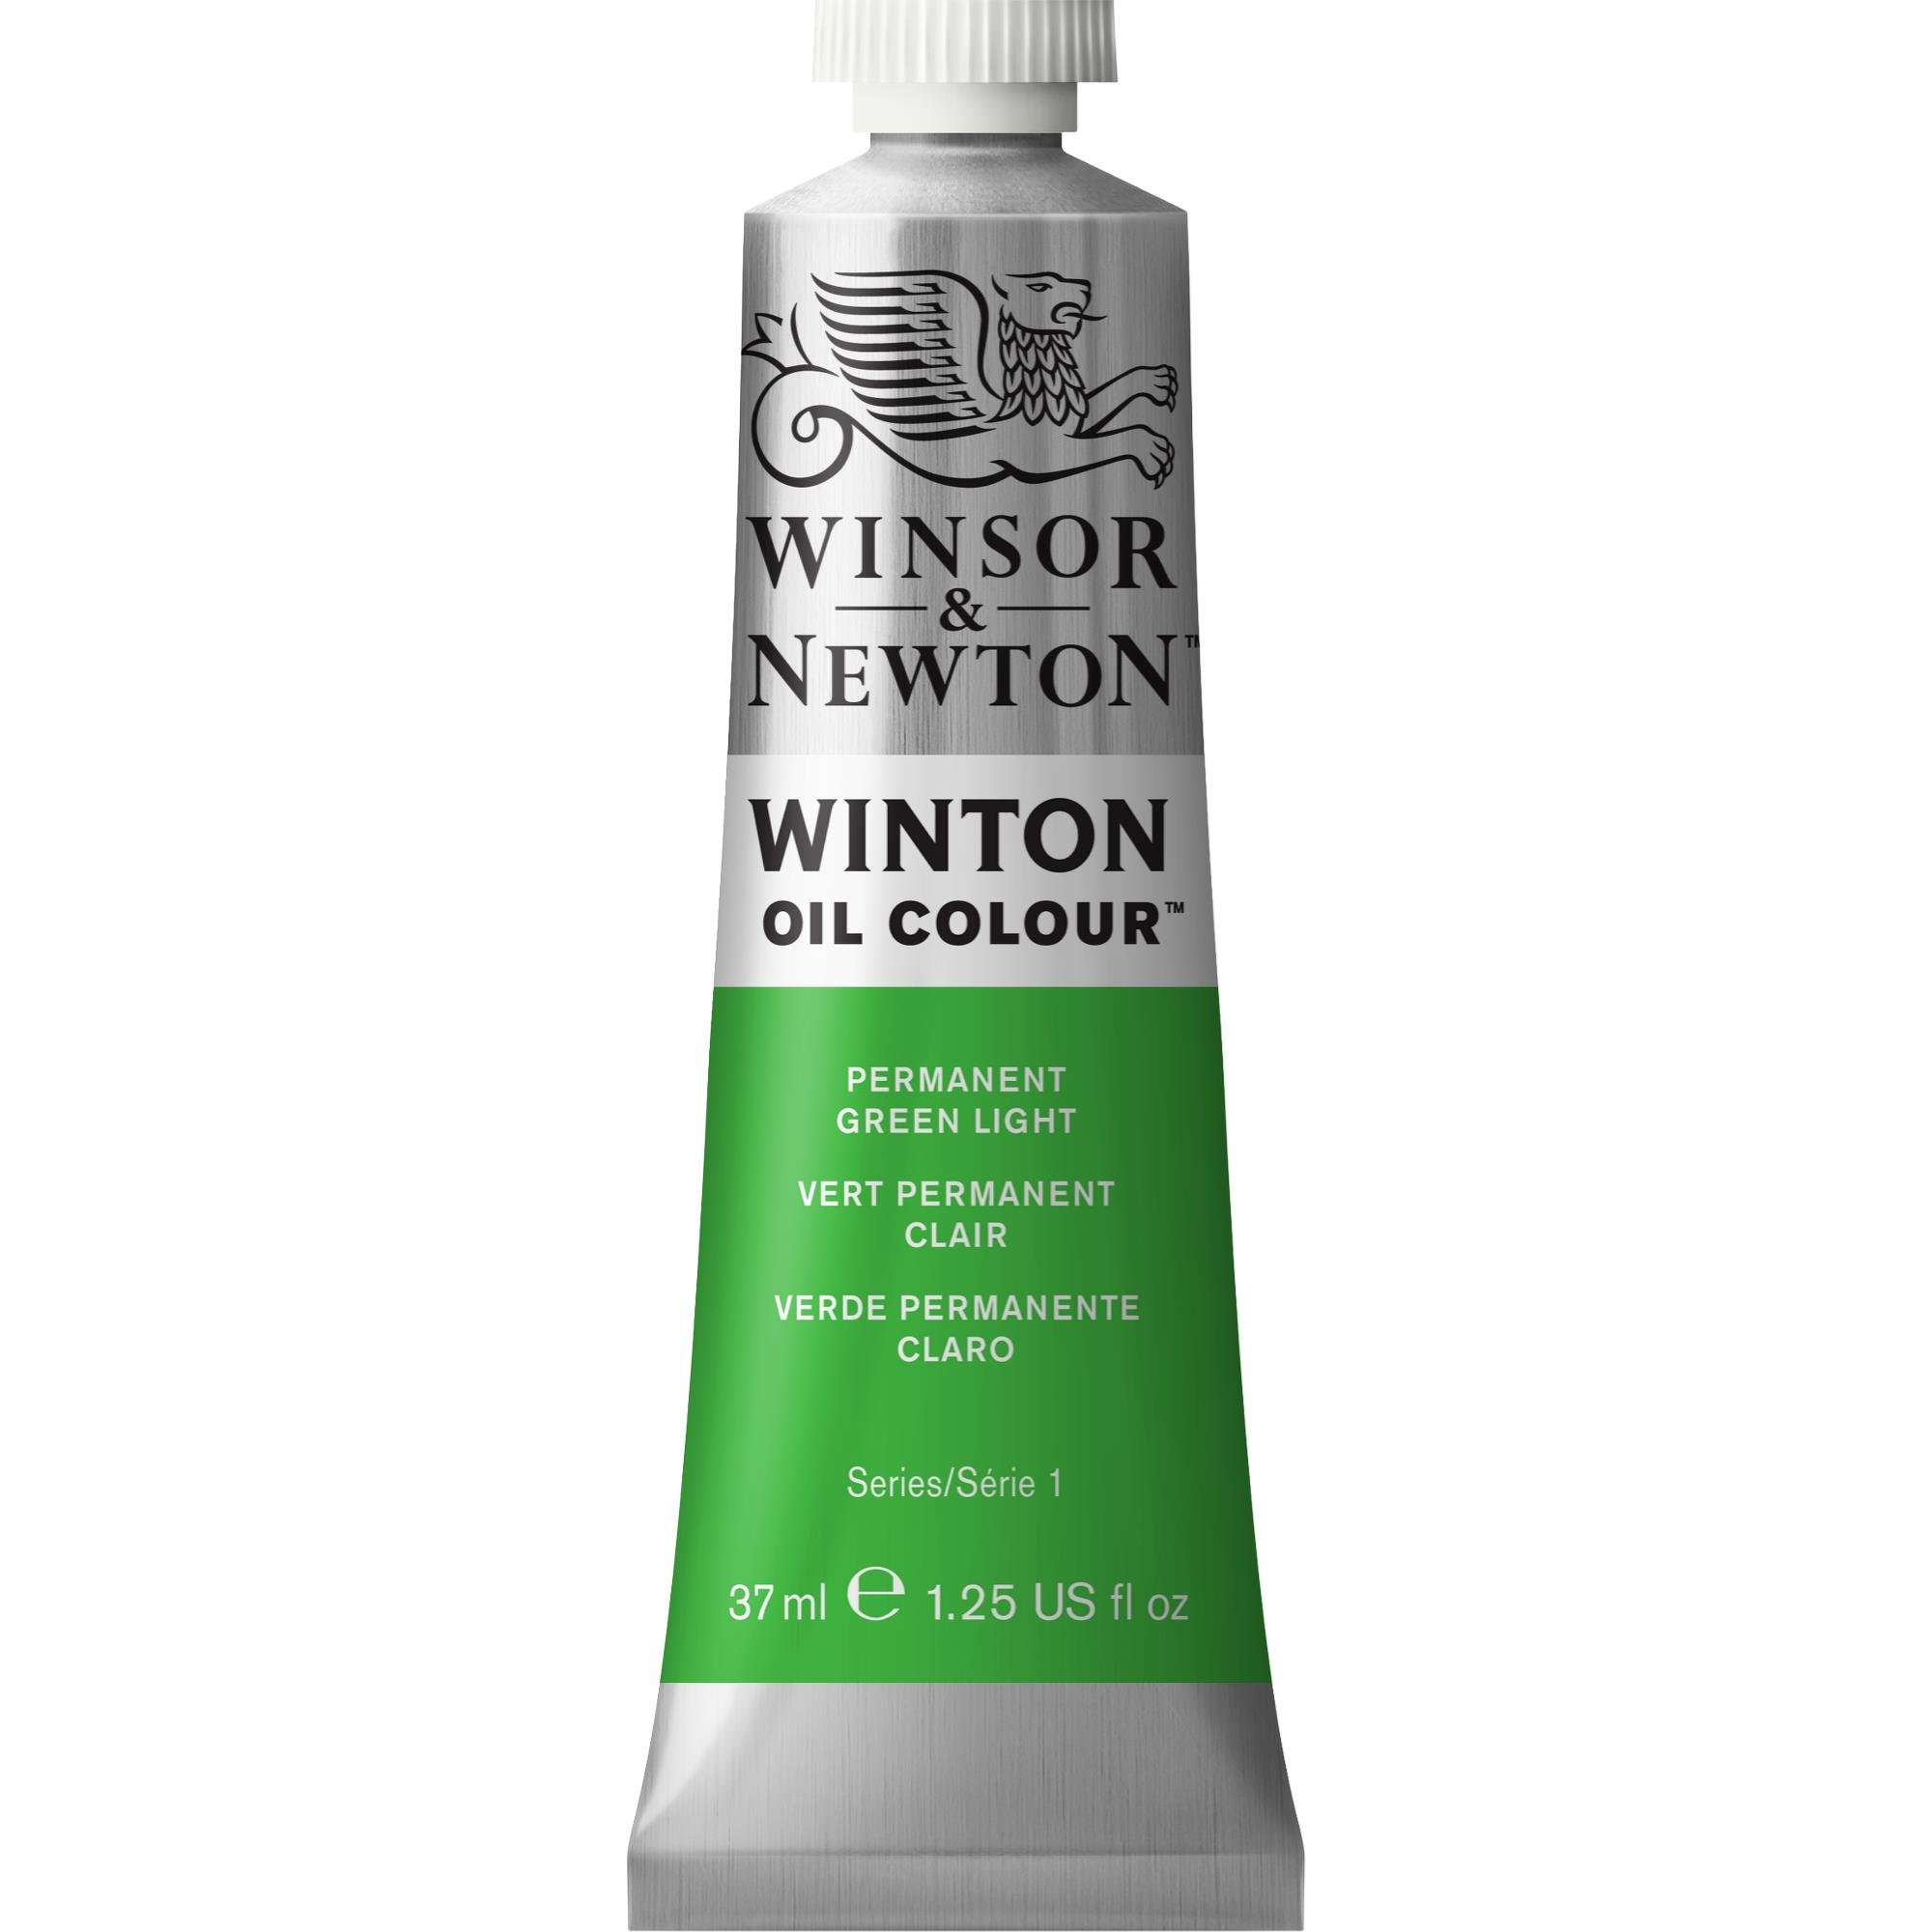 Winsor & Newton Winton Oil Colour Paint, 37ml tube, Permanent Green Light